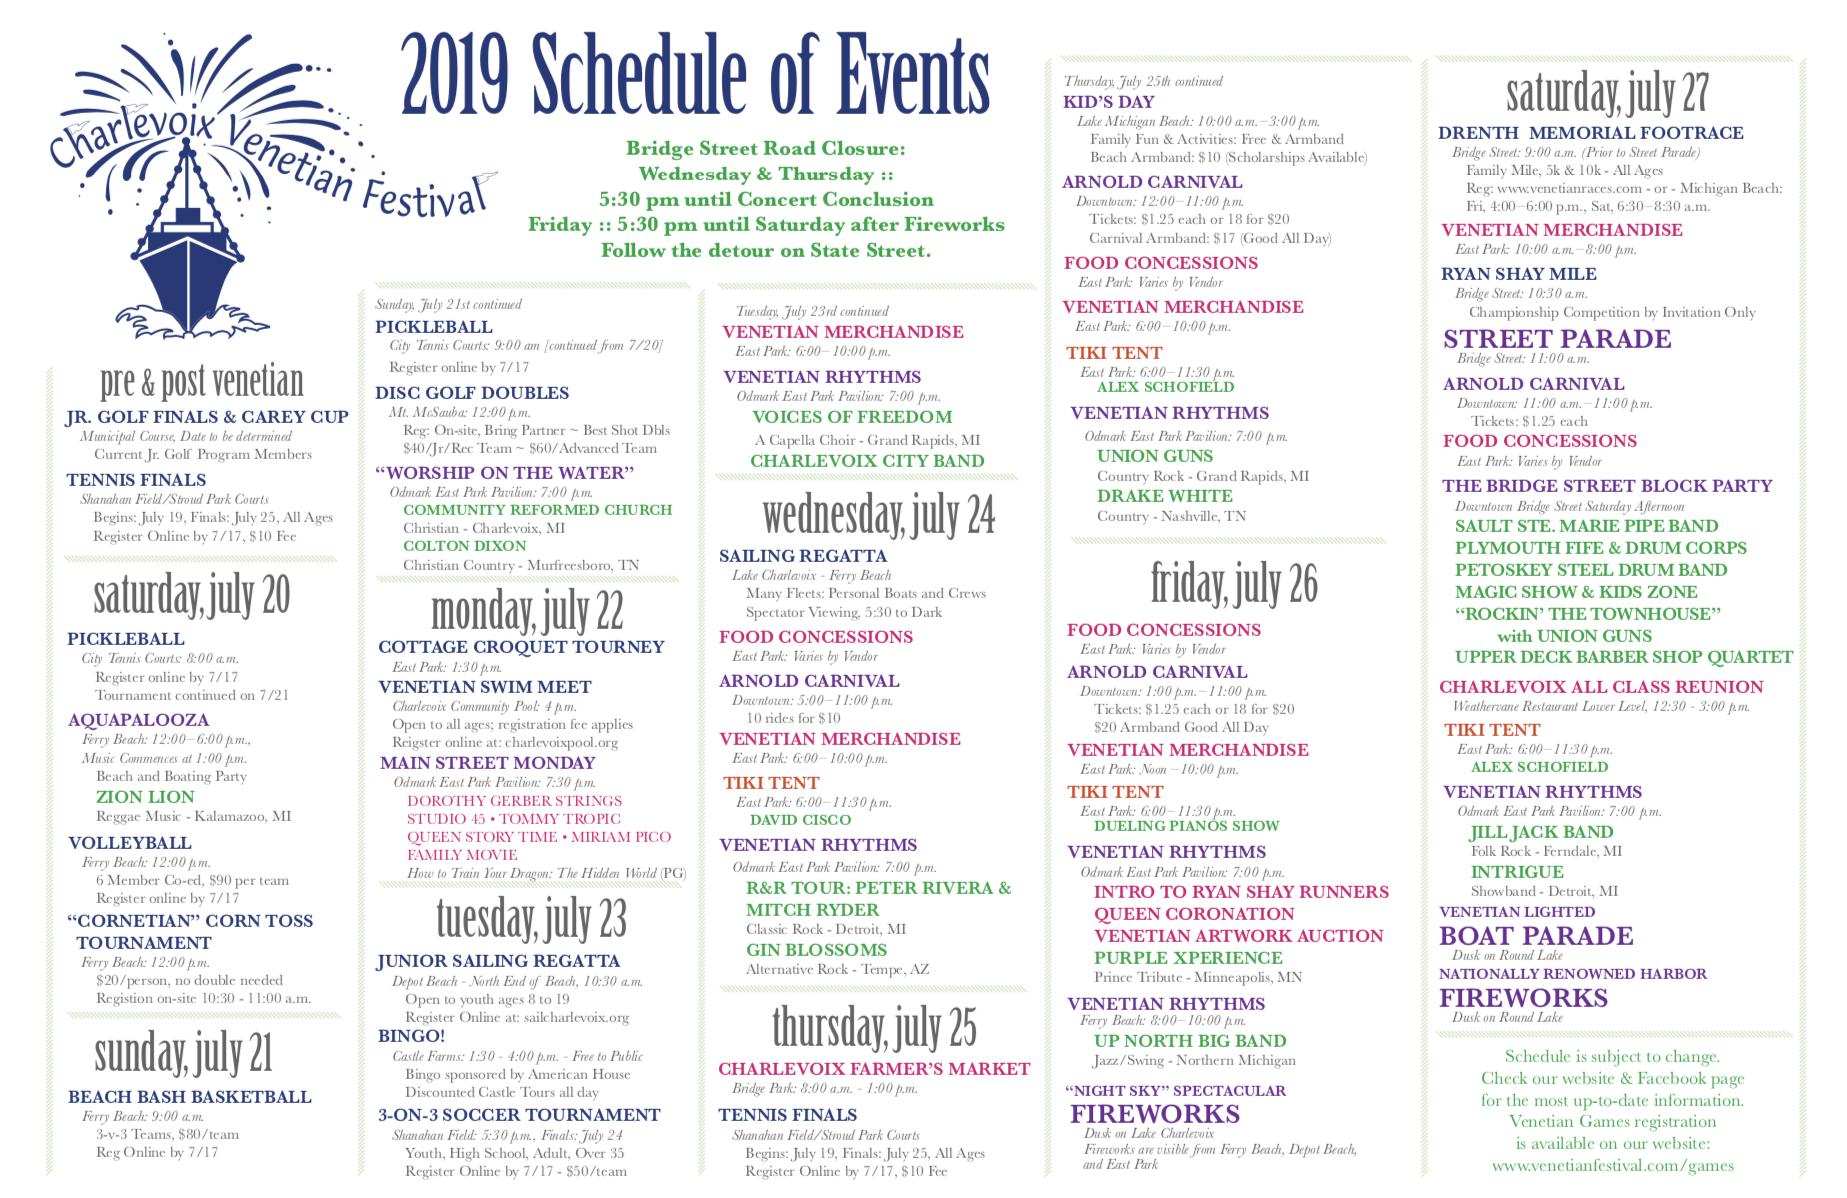 Depo Provera Schedule 2021 | Calendar Template Printable